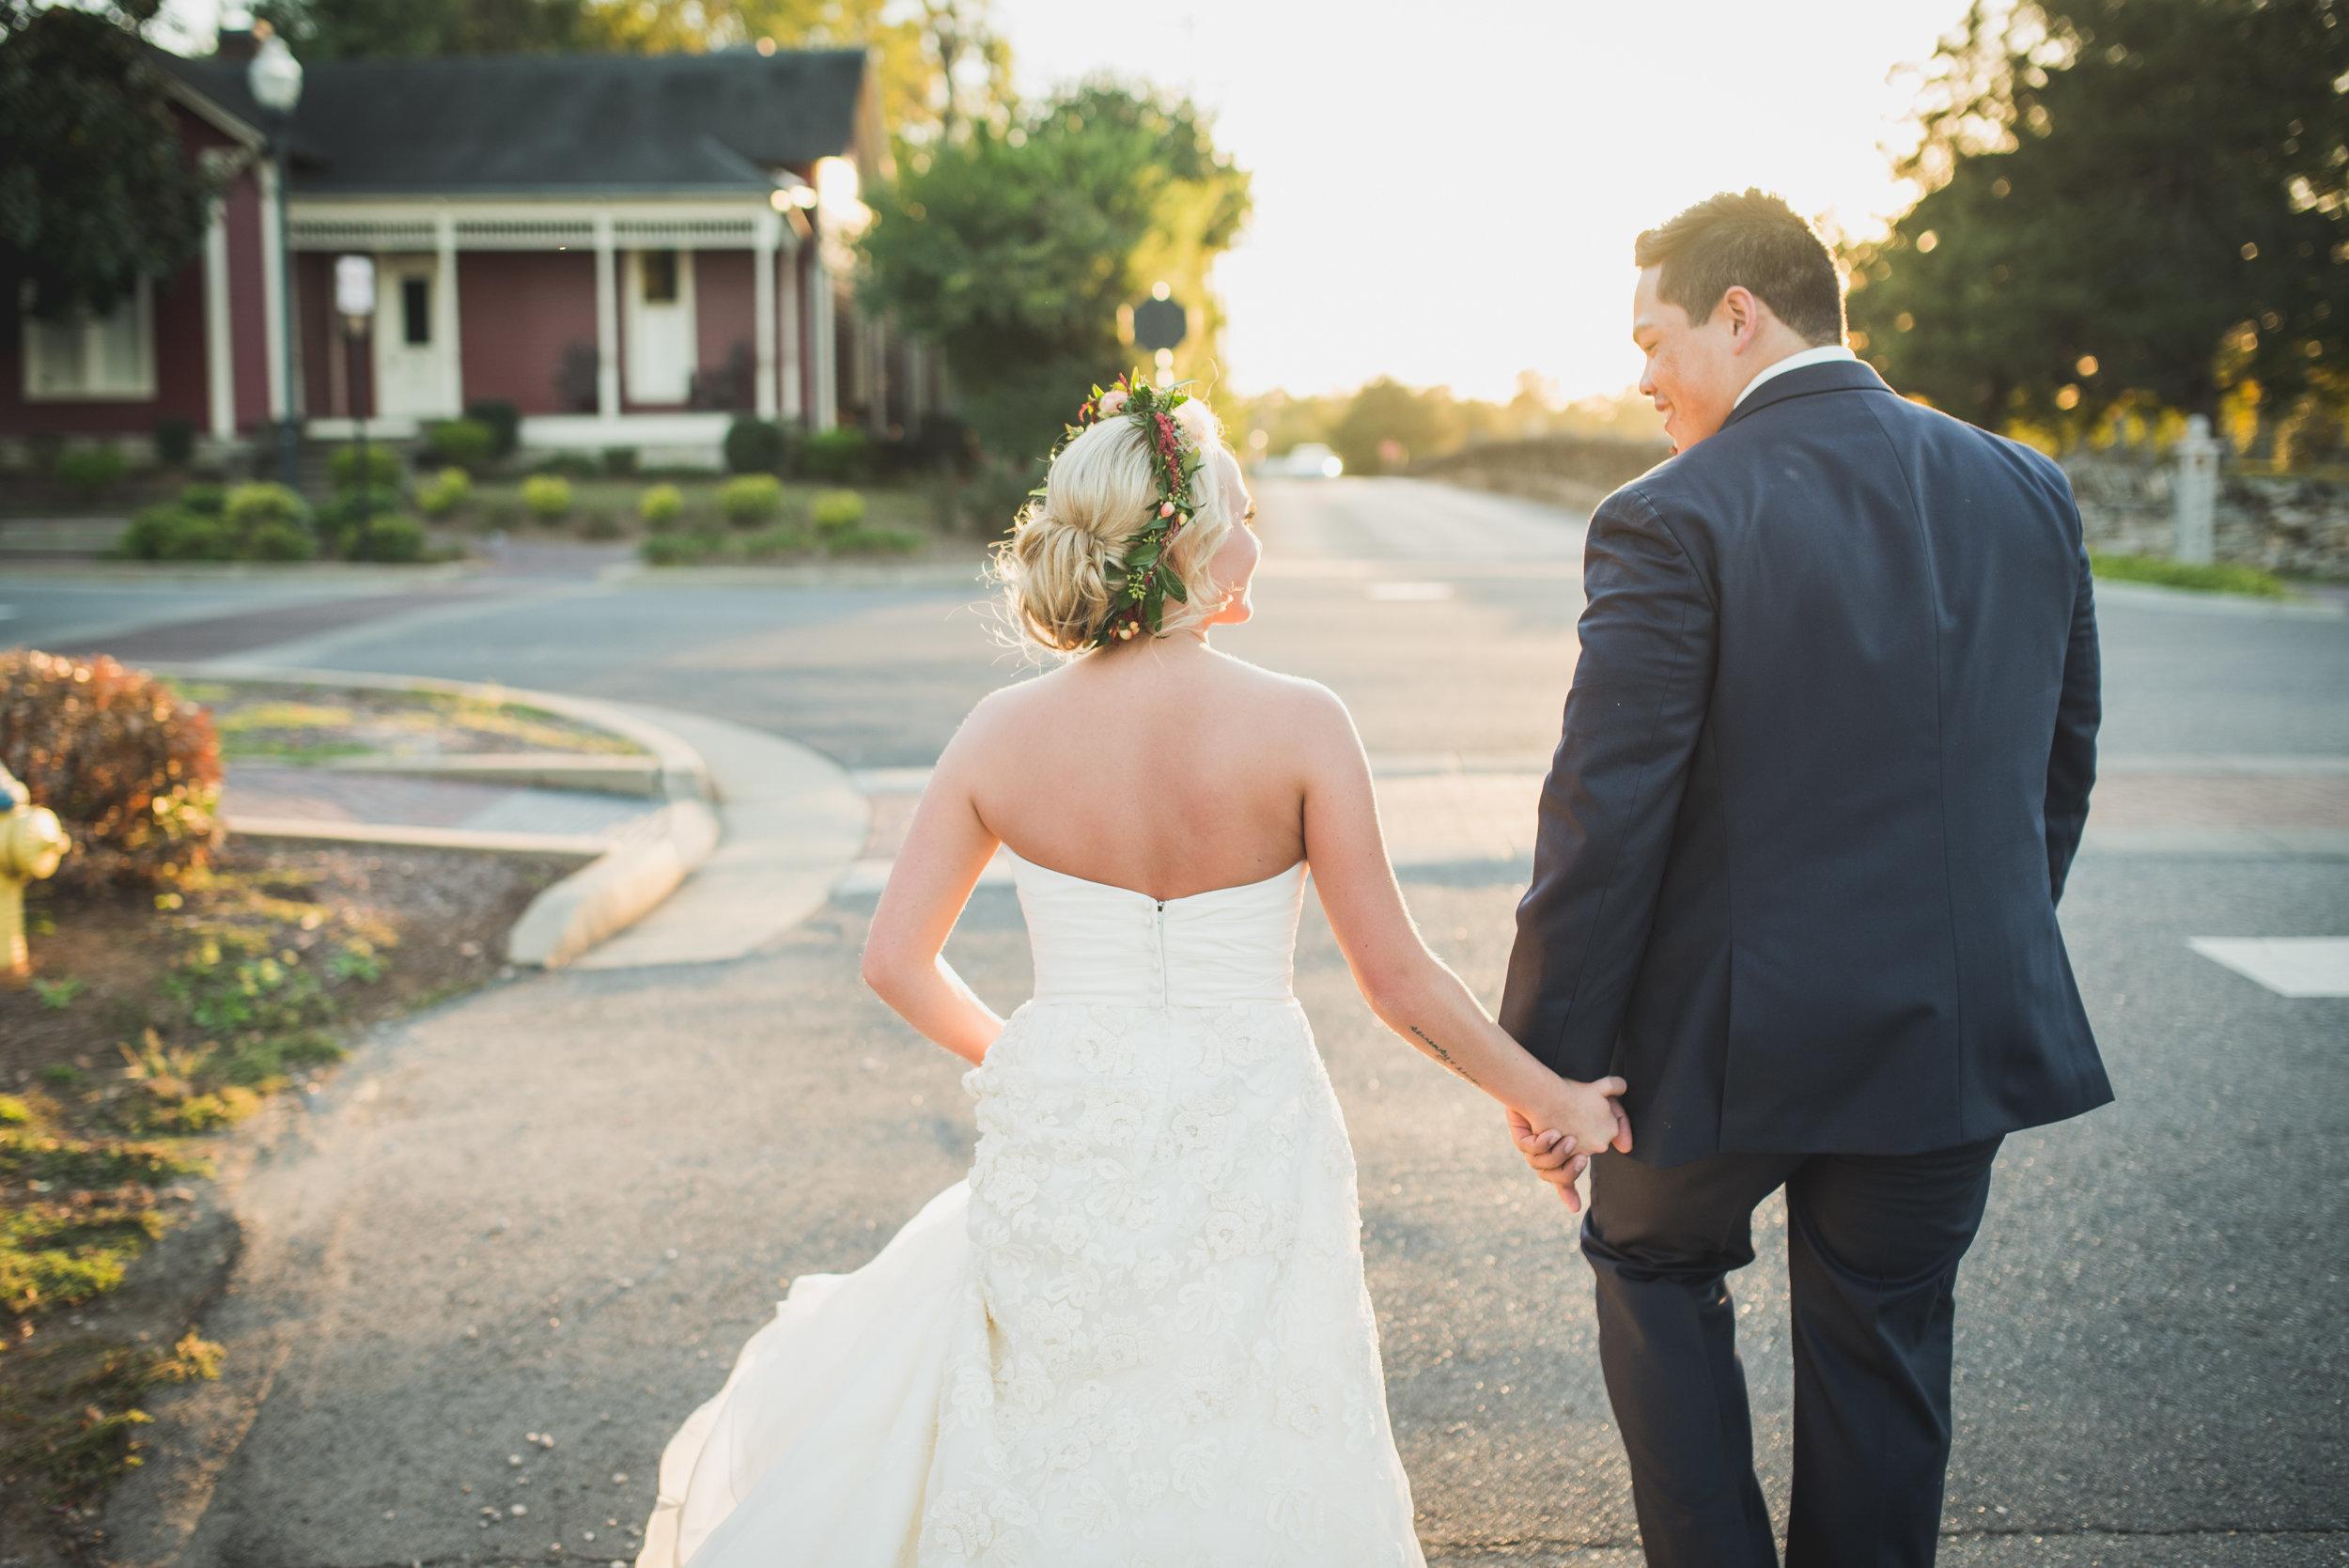 Nashville-wedding-photographers-CJ's-Off-The-Square-53.JPG